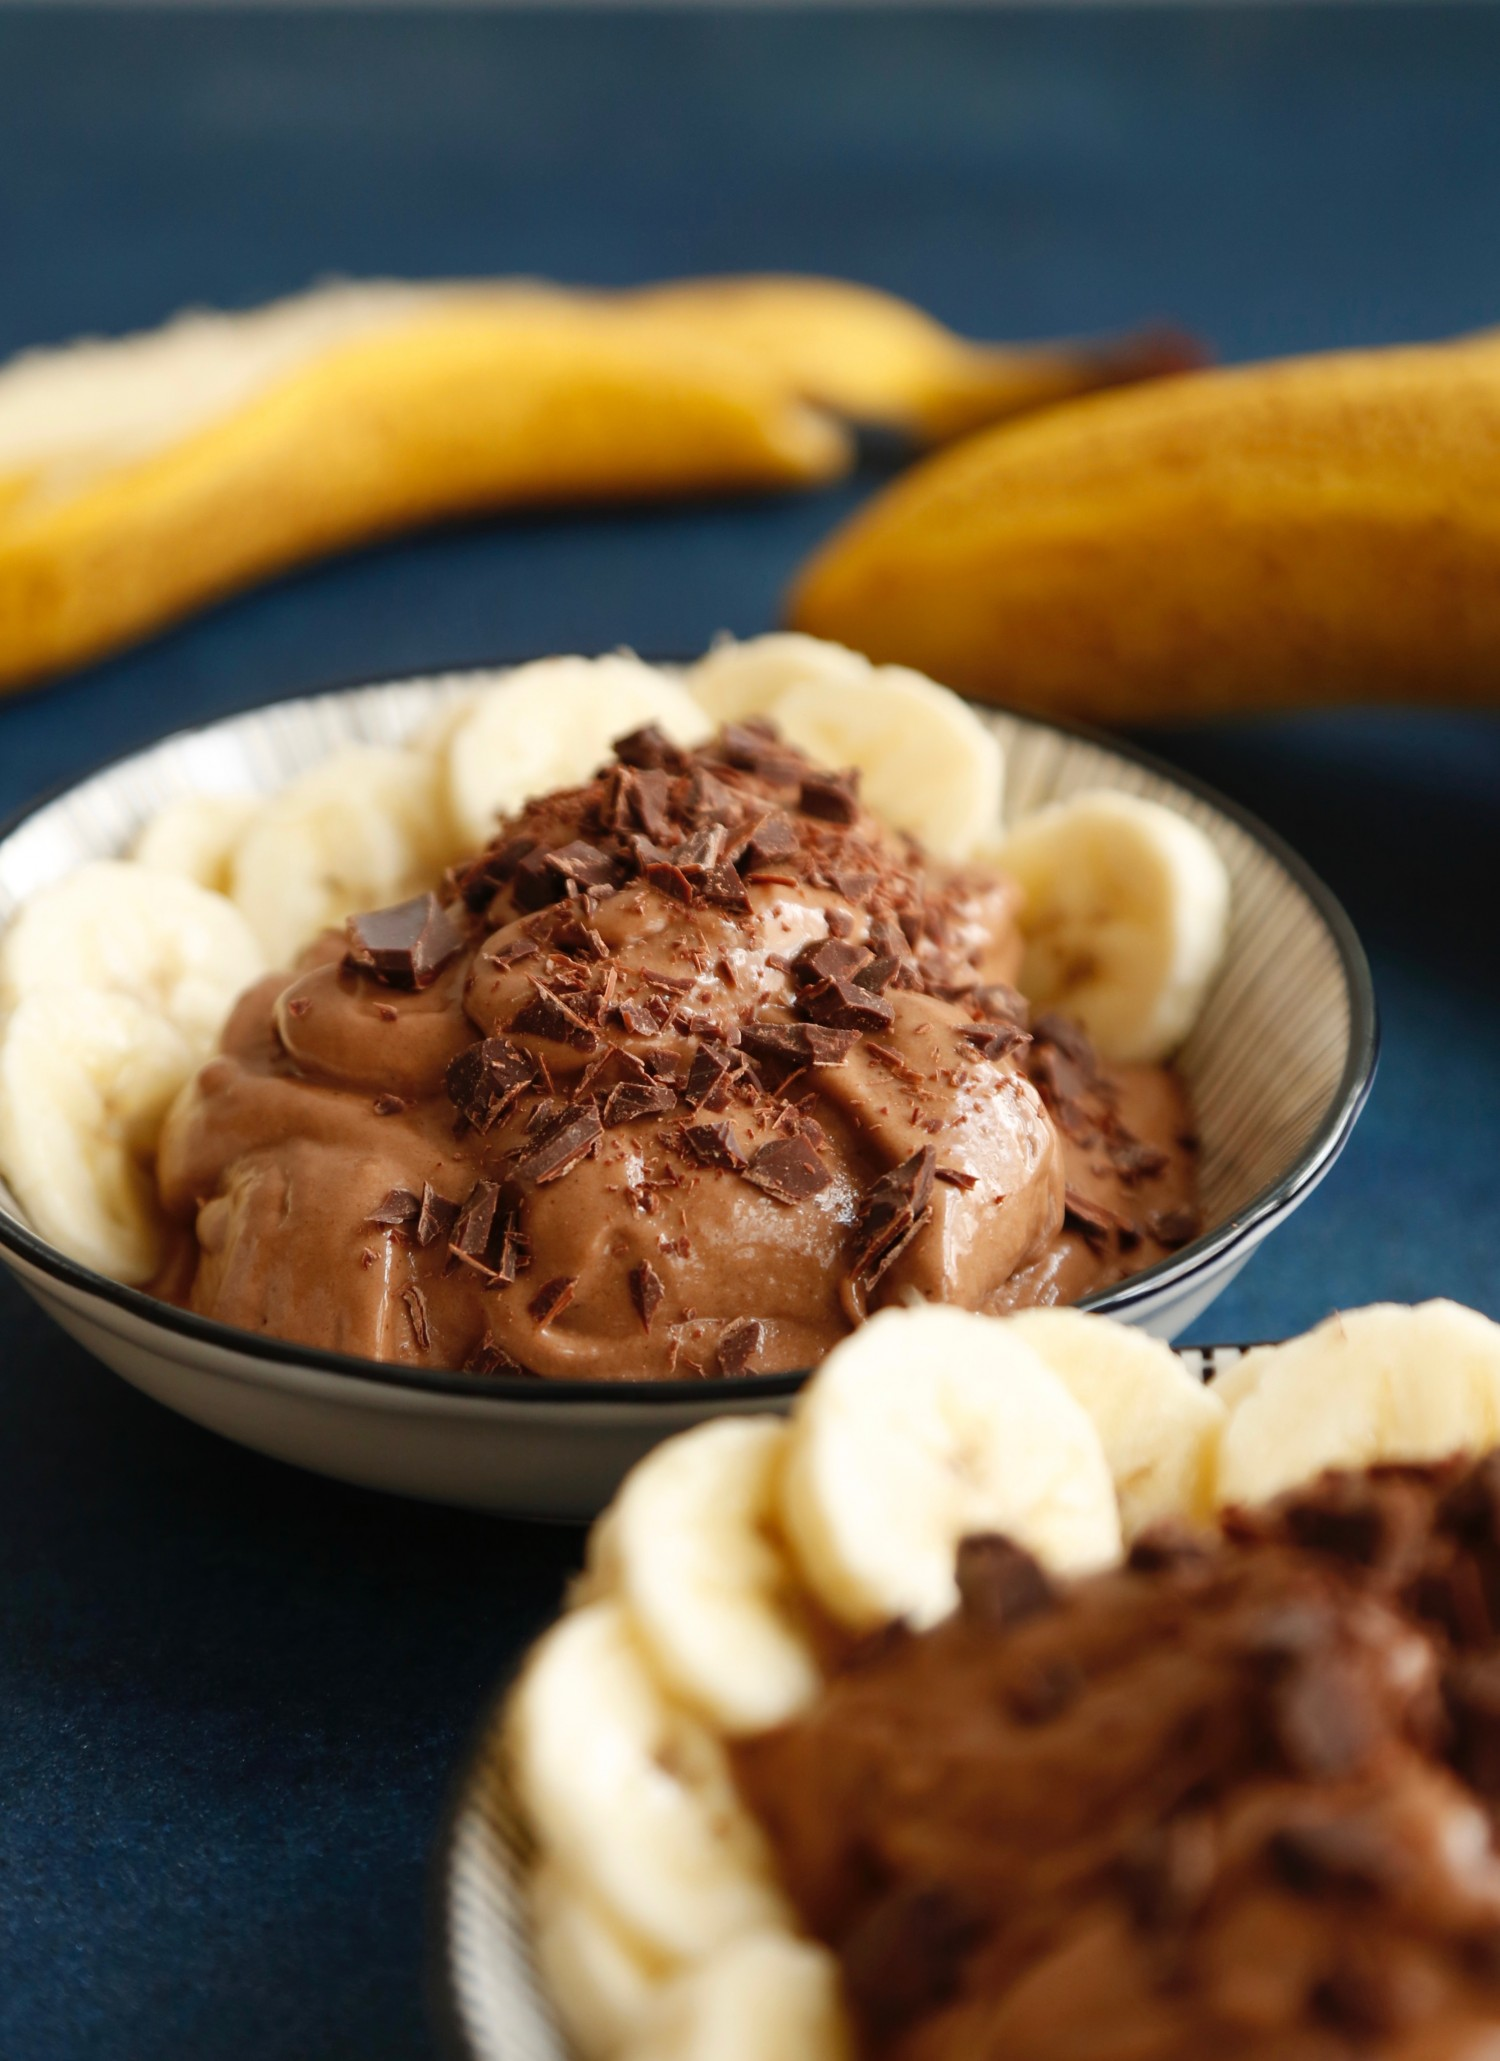 Peanutbutter nicecream med chokolade3